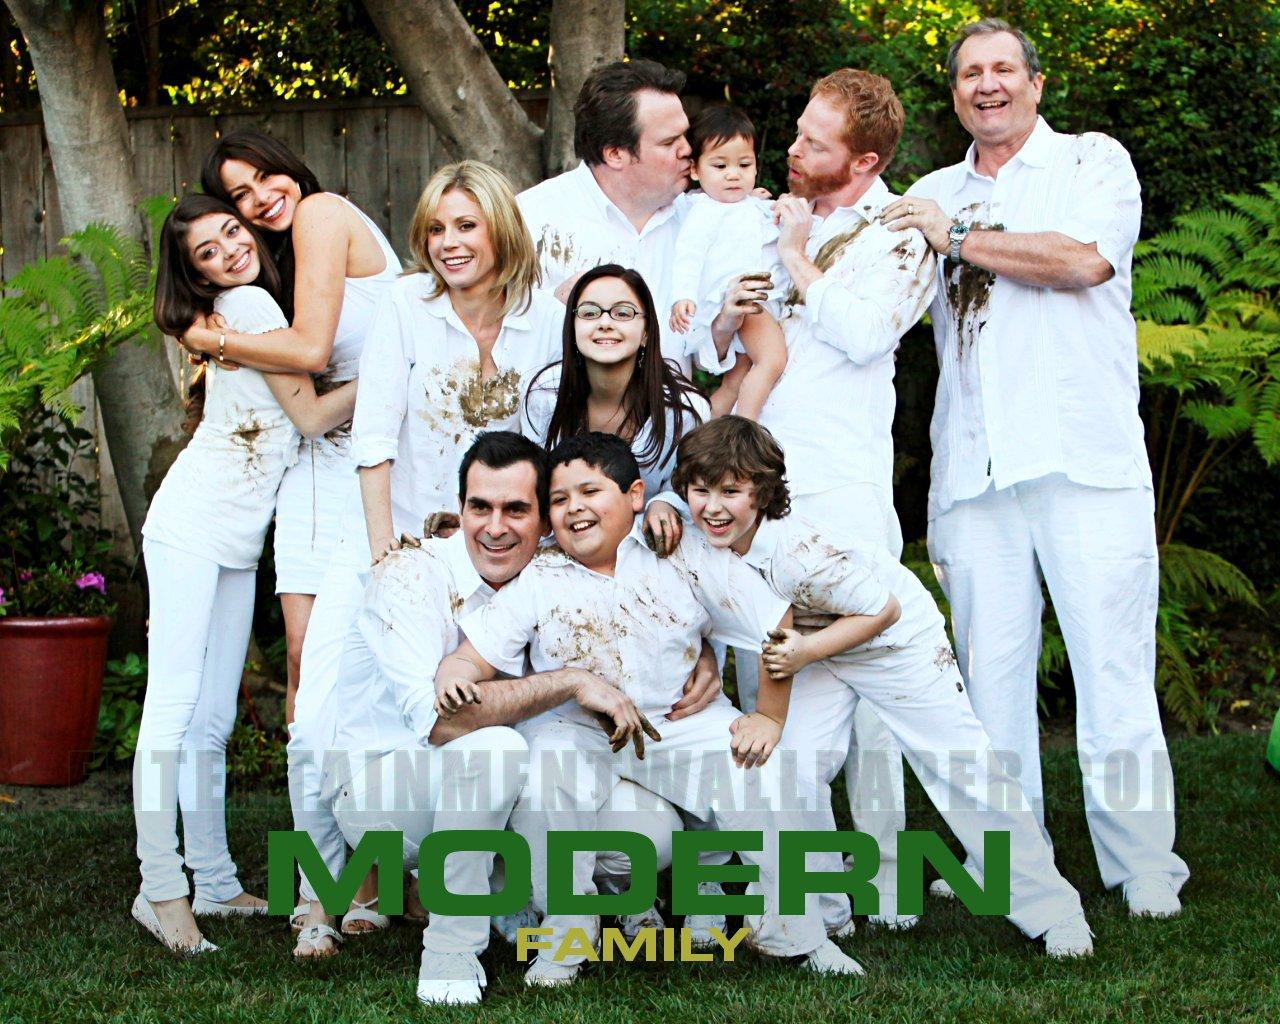 modern family wallpaper 20024273 size 1280x1024 more modern family 1280x1024